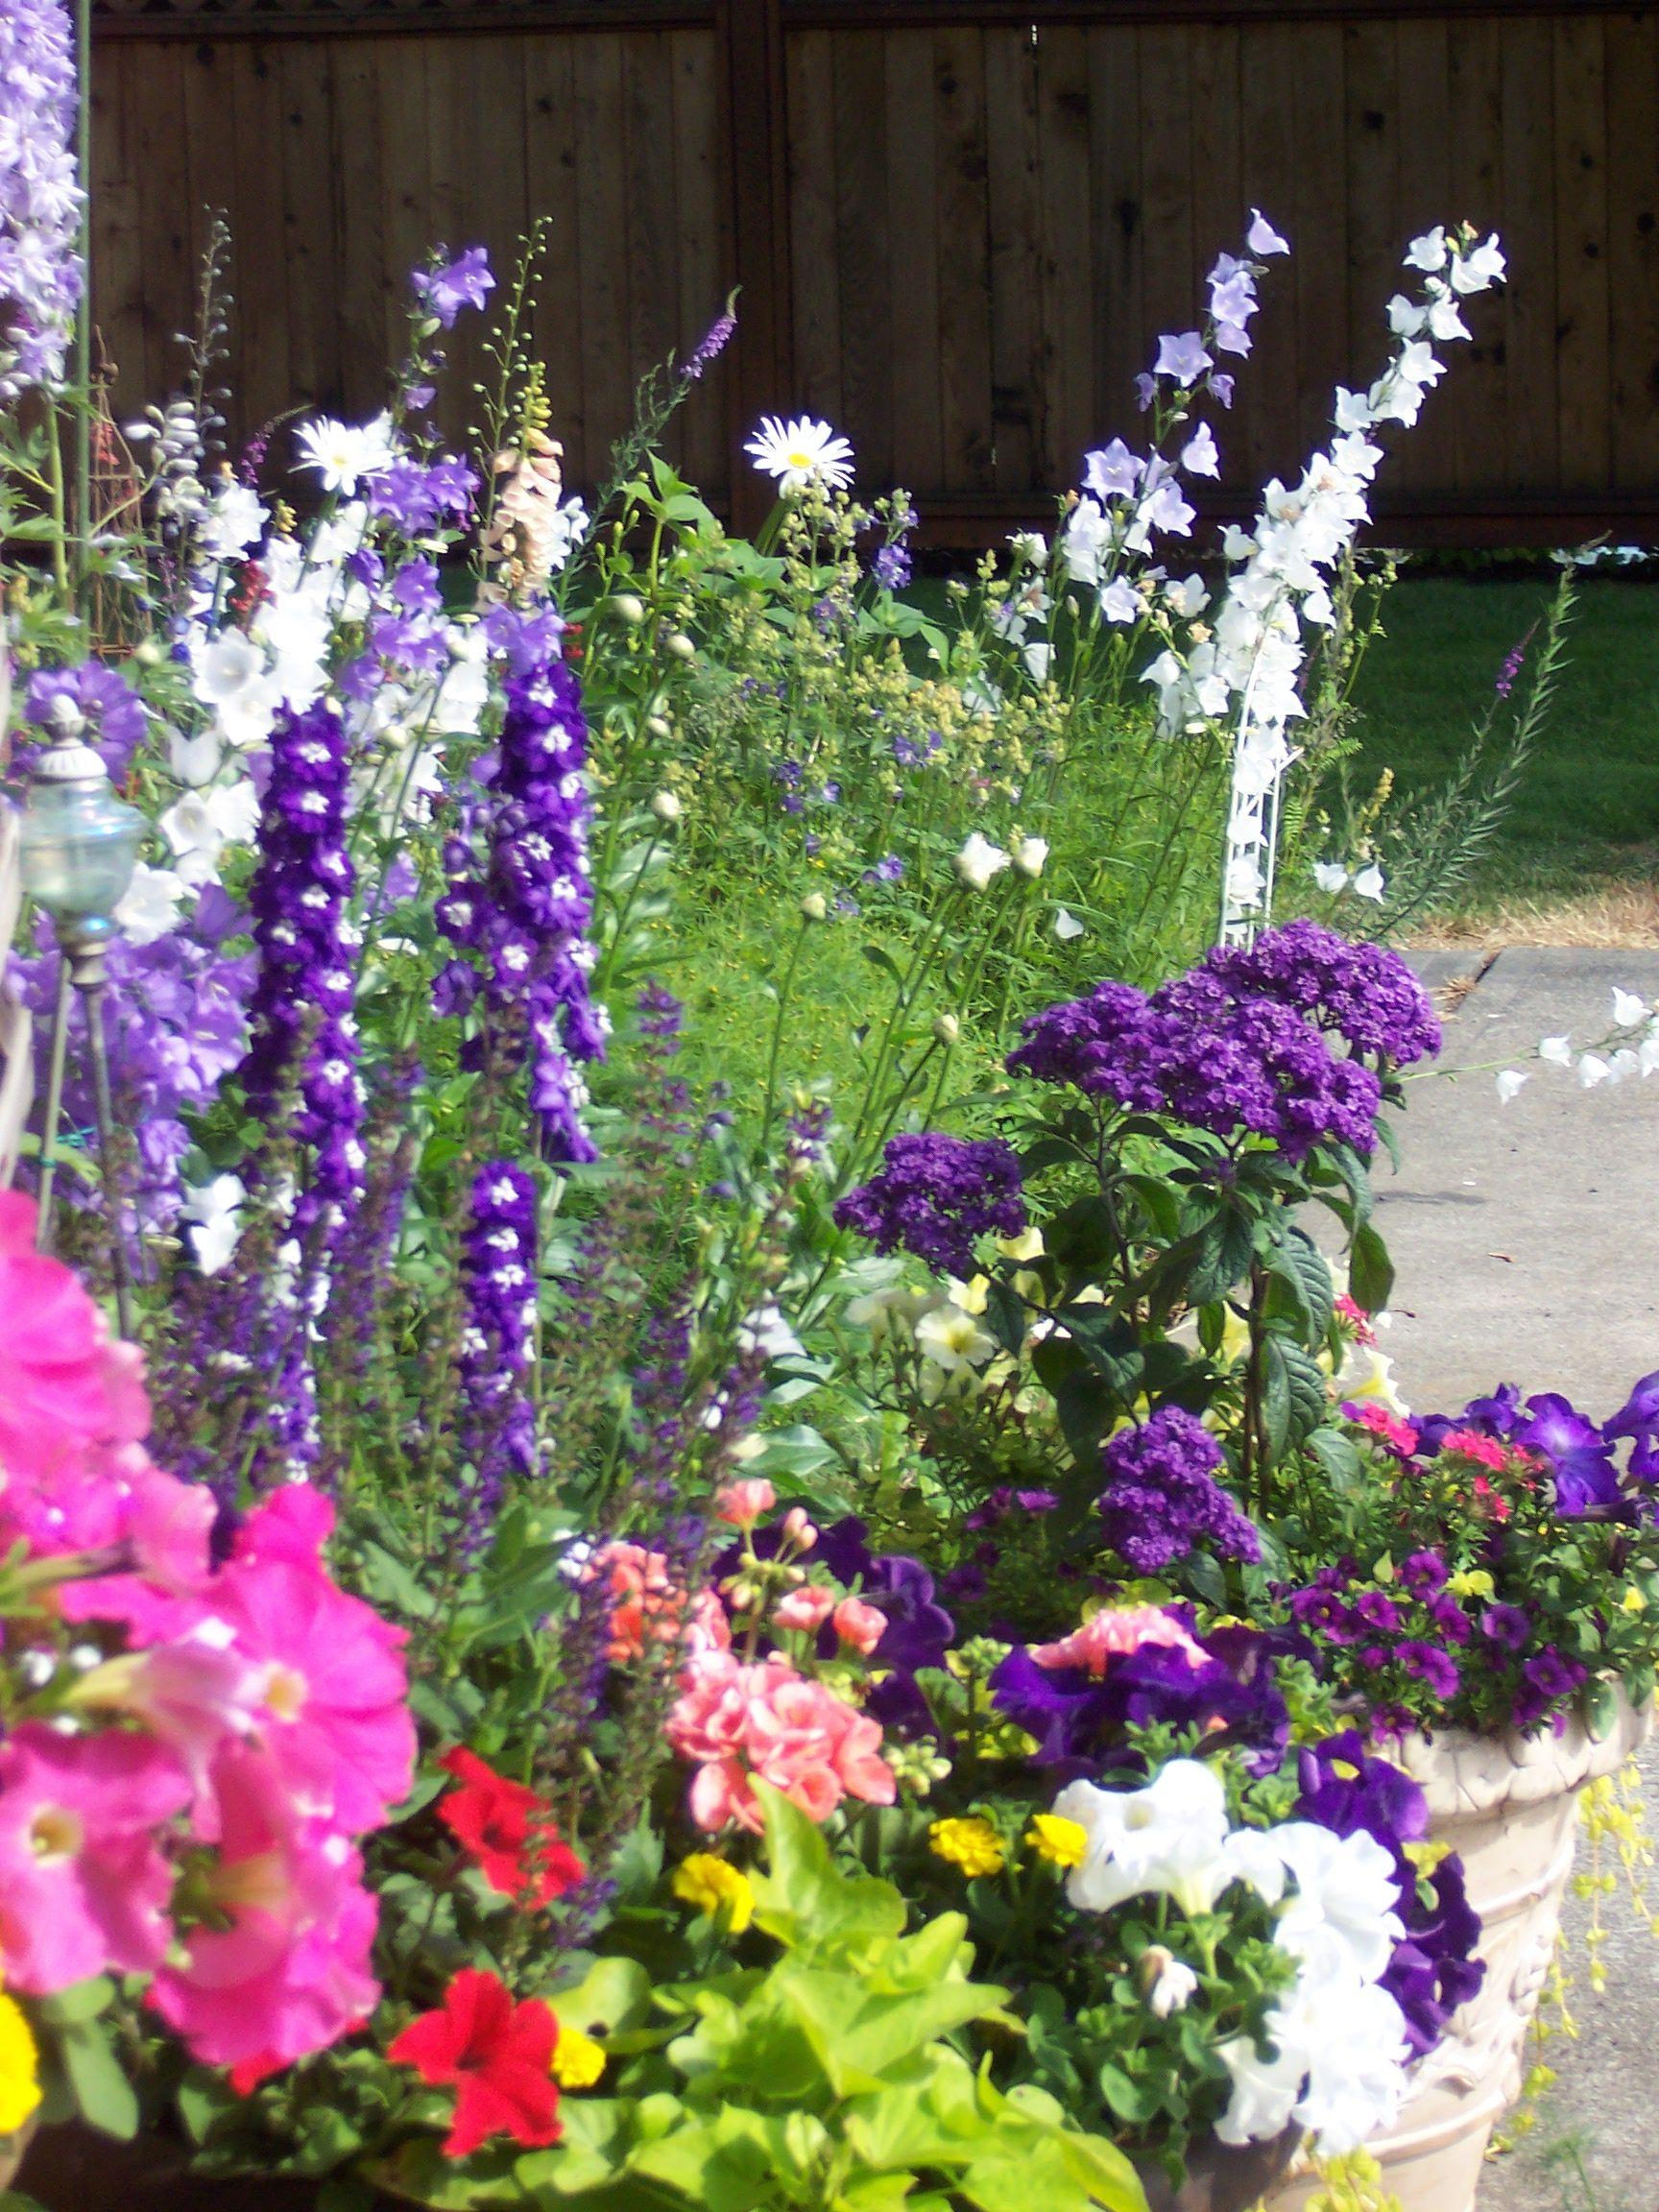 Hellebore Delphinium Potato Canterbury Bells And Petunias Delphinium Petunias Flower Pots